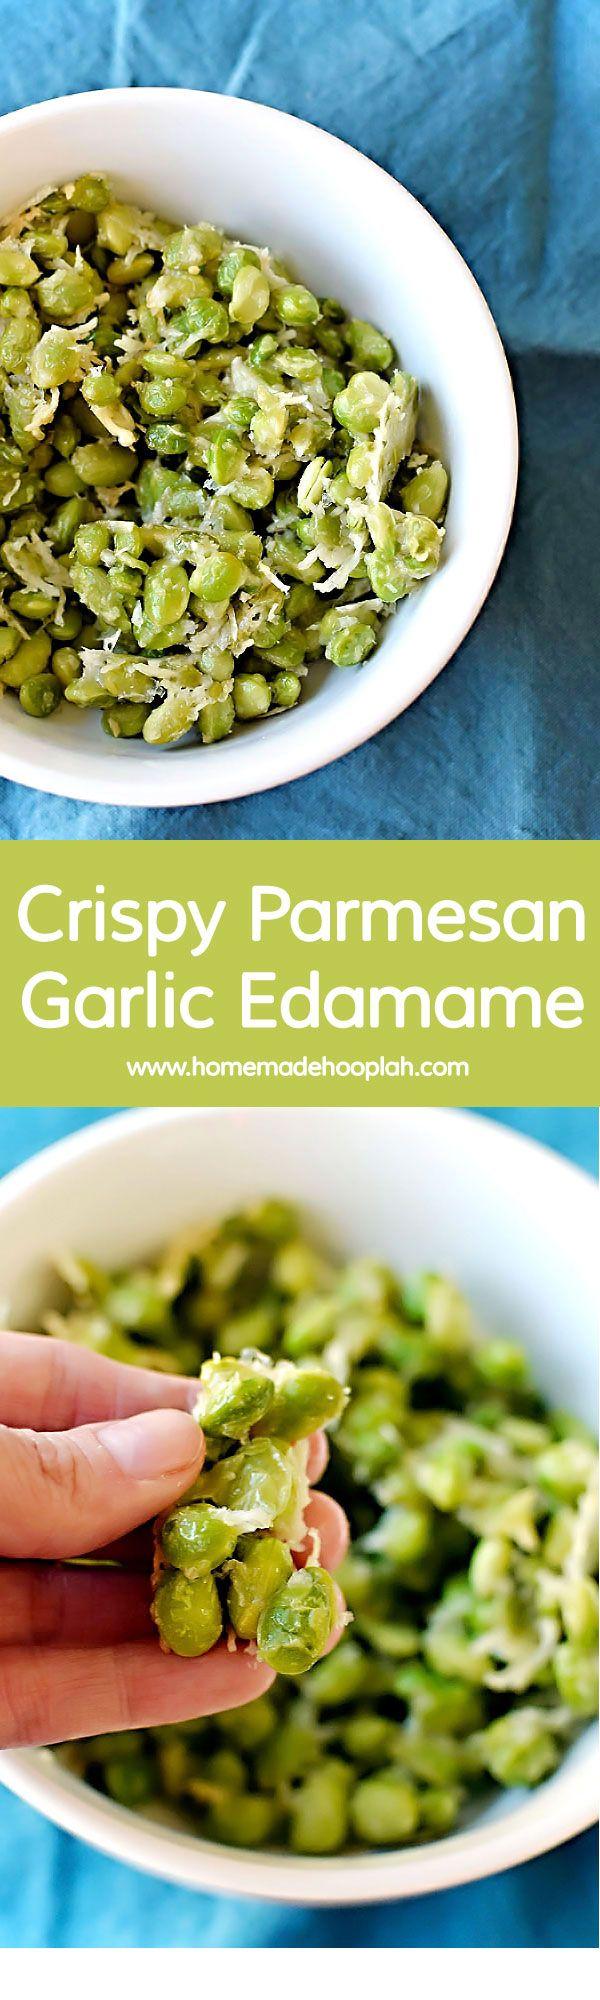 Crispy Parmesan Garlic Edamame! Baked in the oven, this parmesan garlic edamame is a tasty snack with only 123 calories! | HomemadeHooplah.com